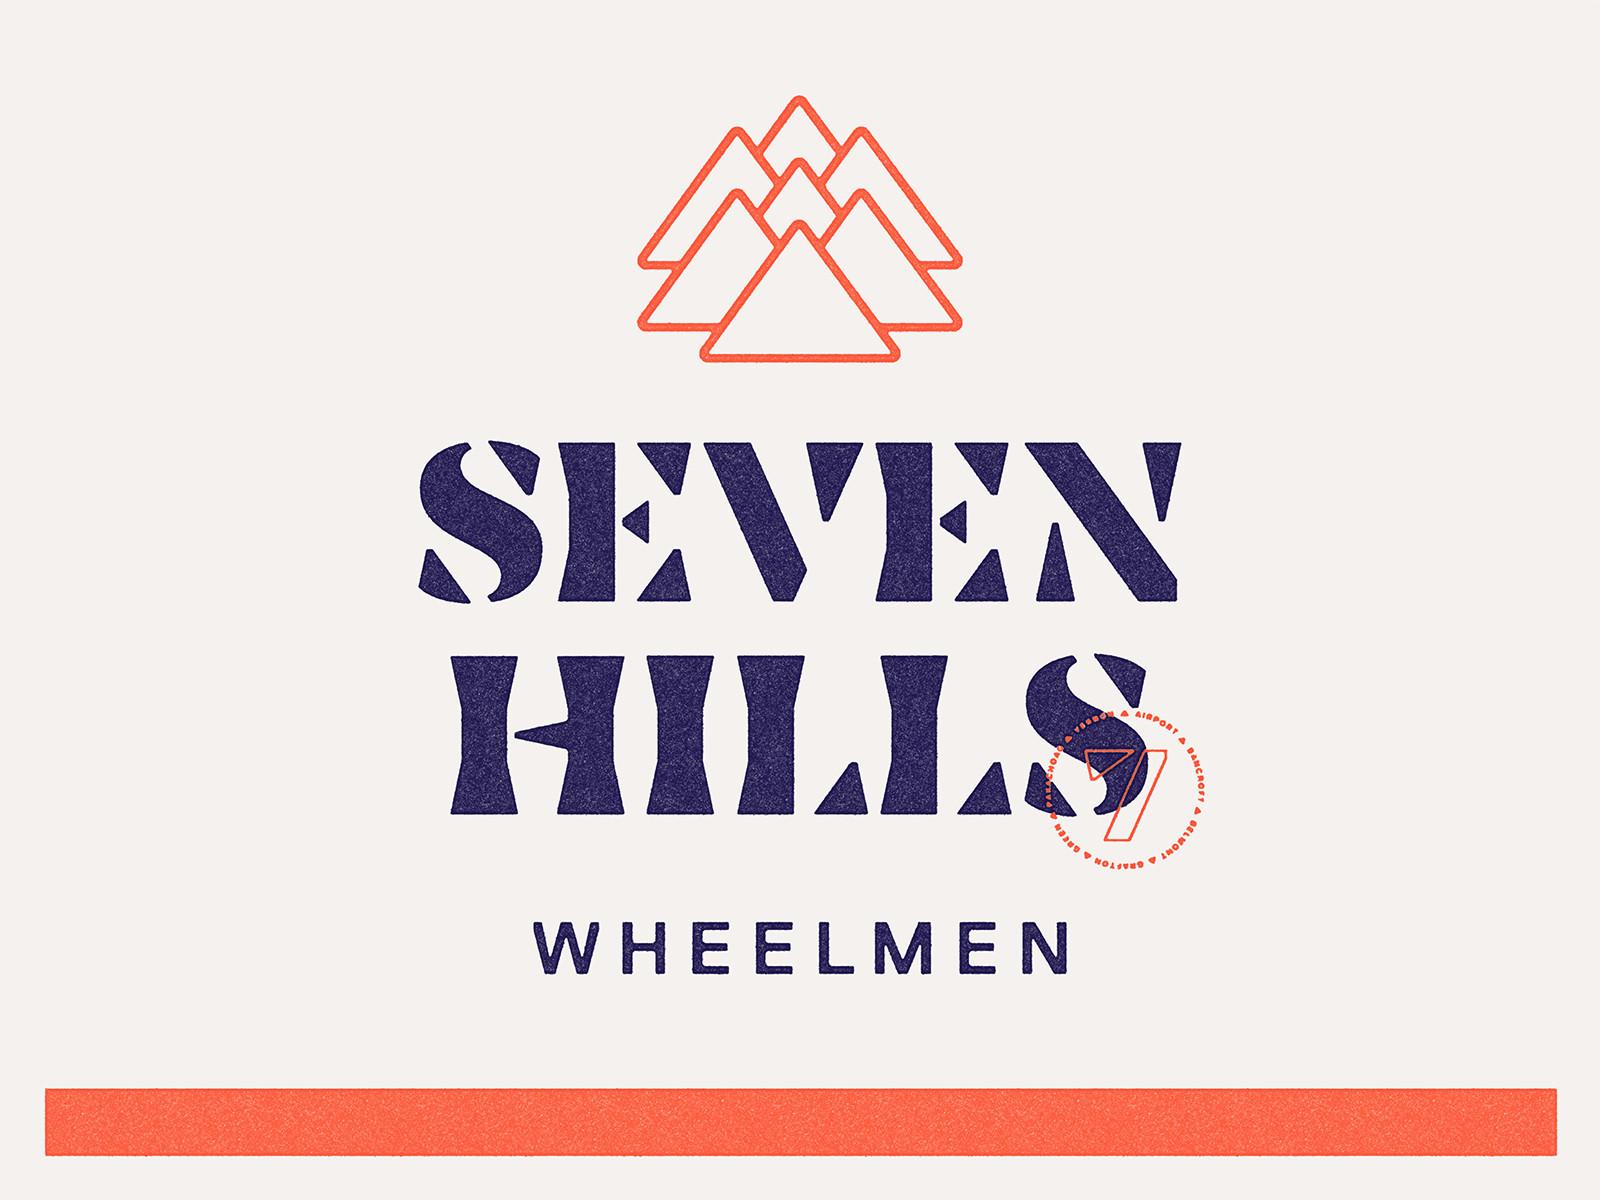 seven-hills-wheelmen-treated-logo-1600.jpg